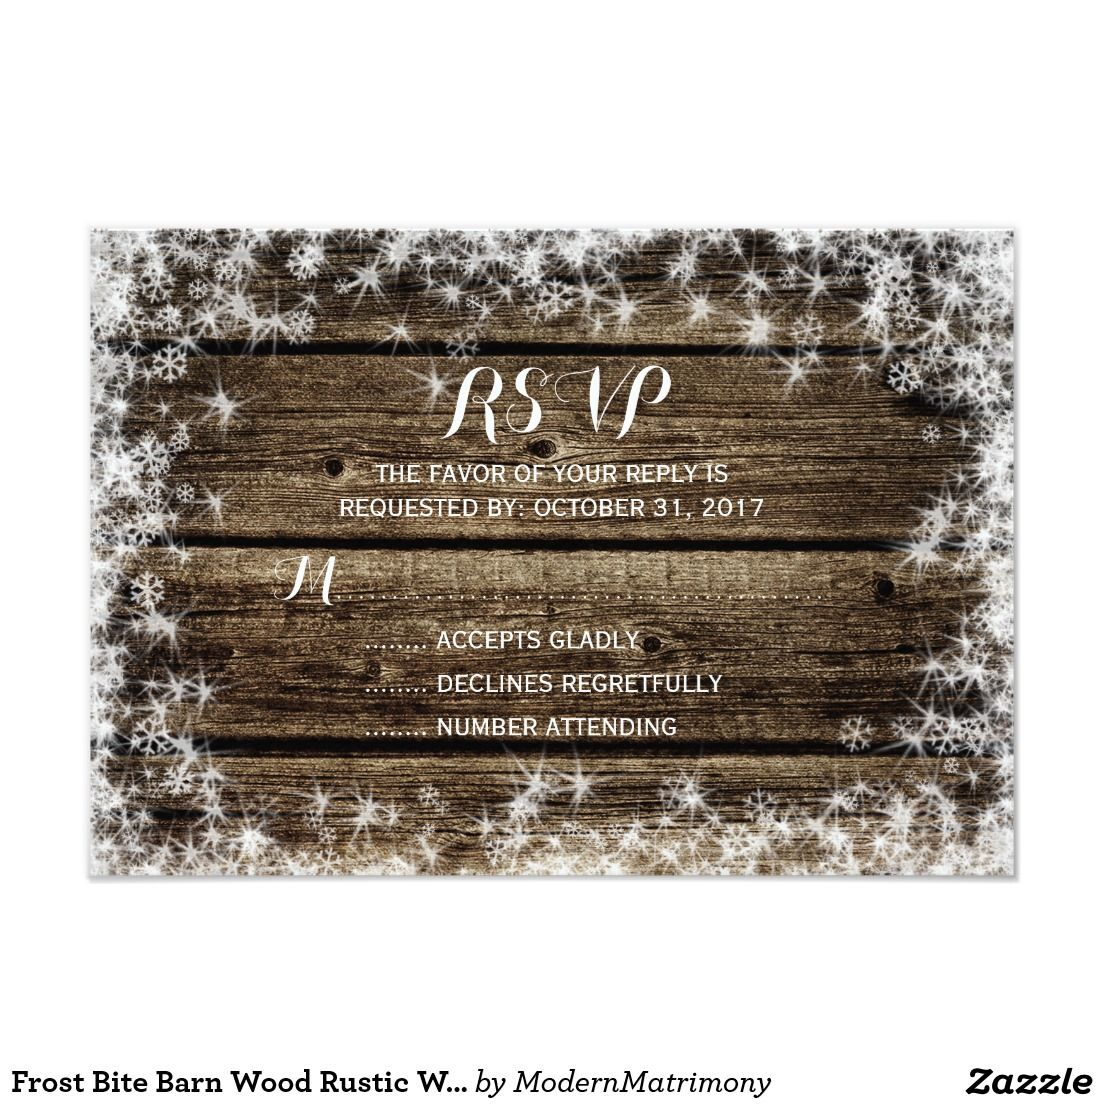 Frost Bite Barn Wood Rustic Winter Wedding RSVP Zazzle